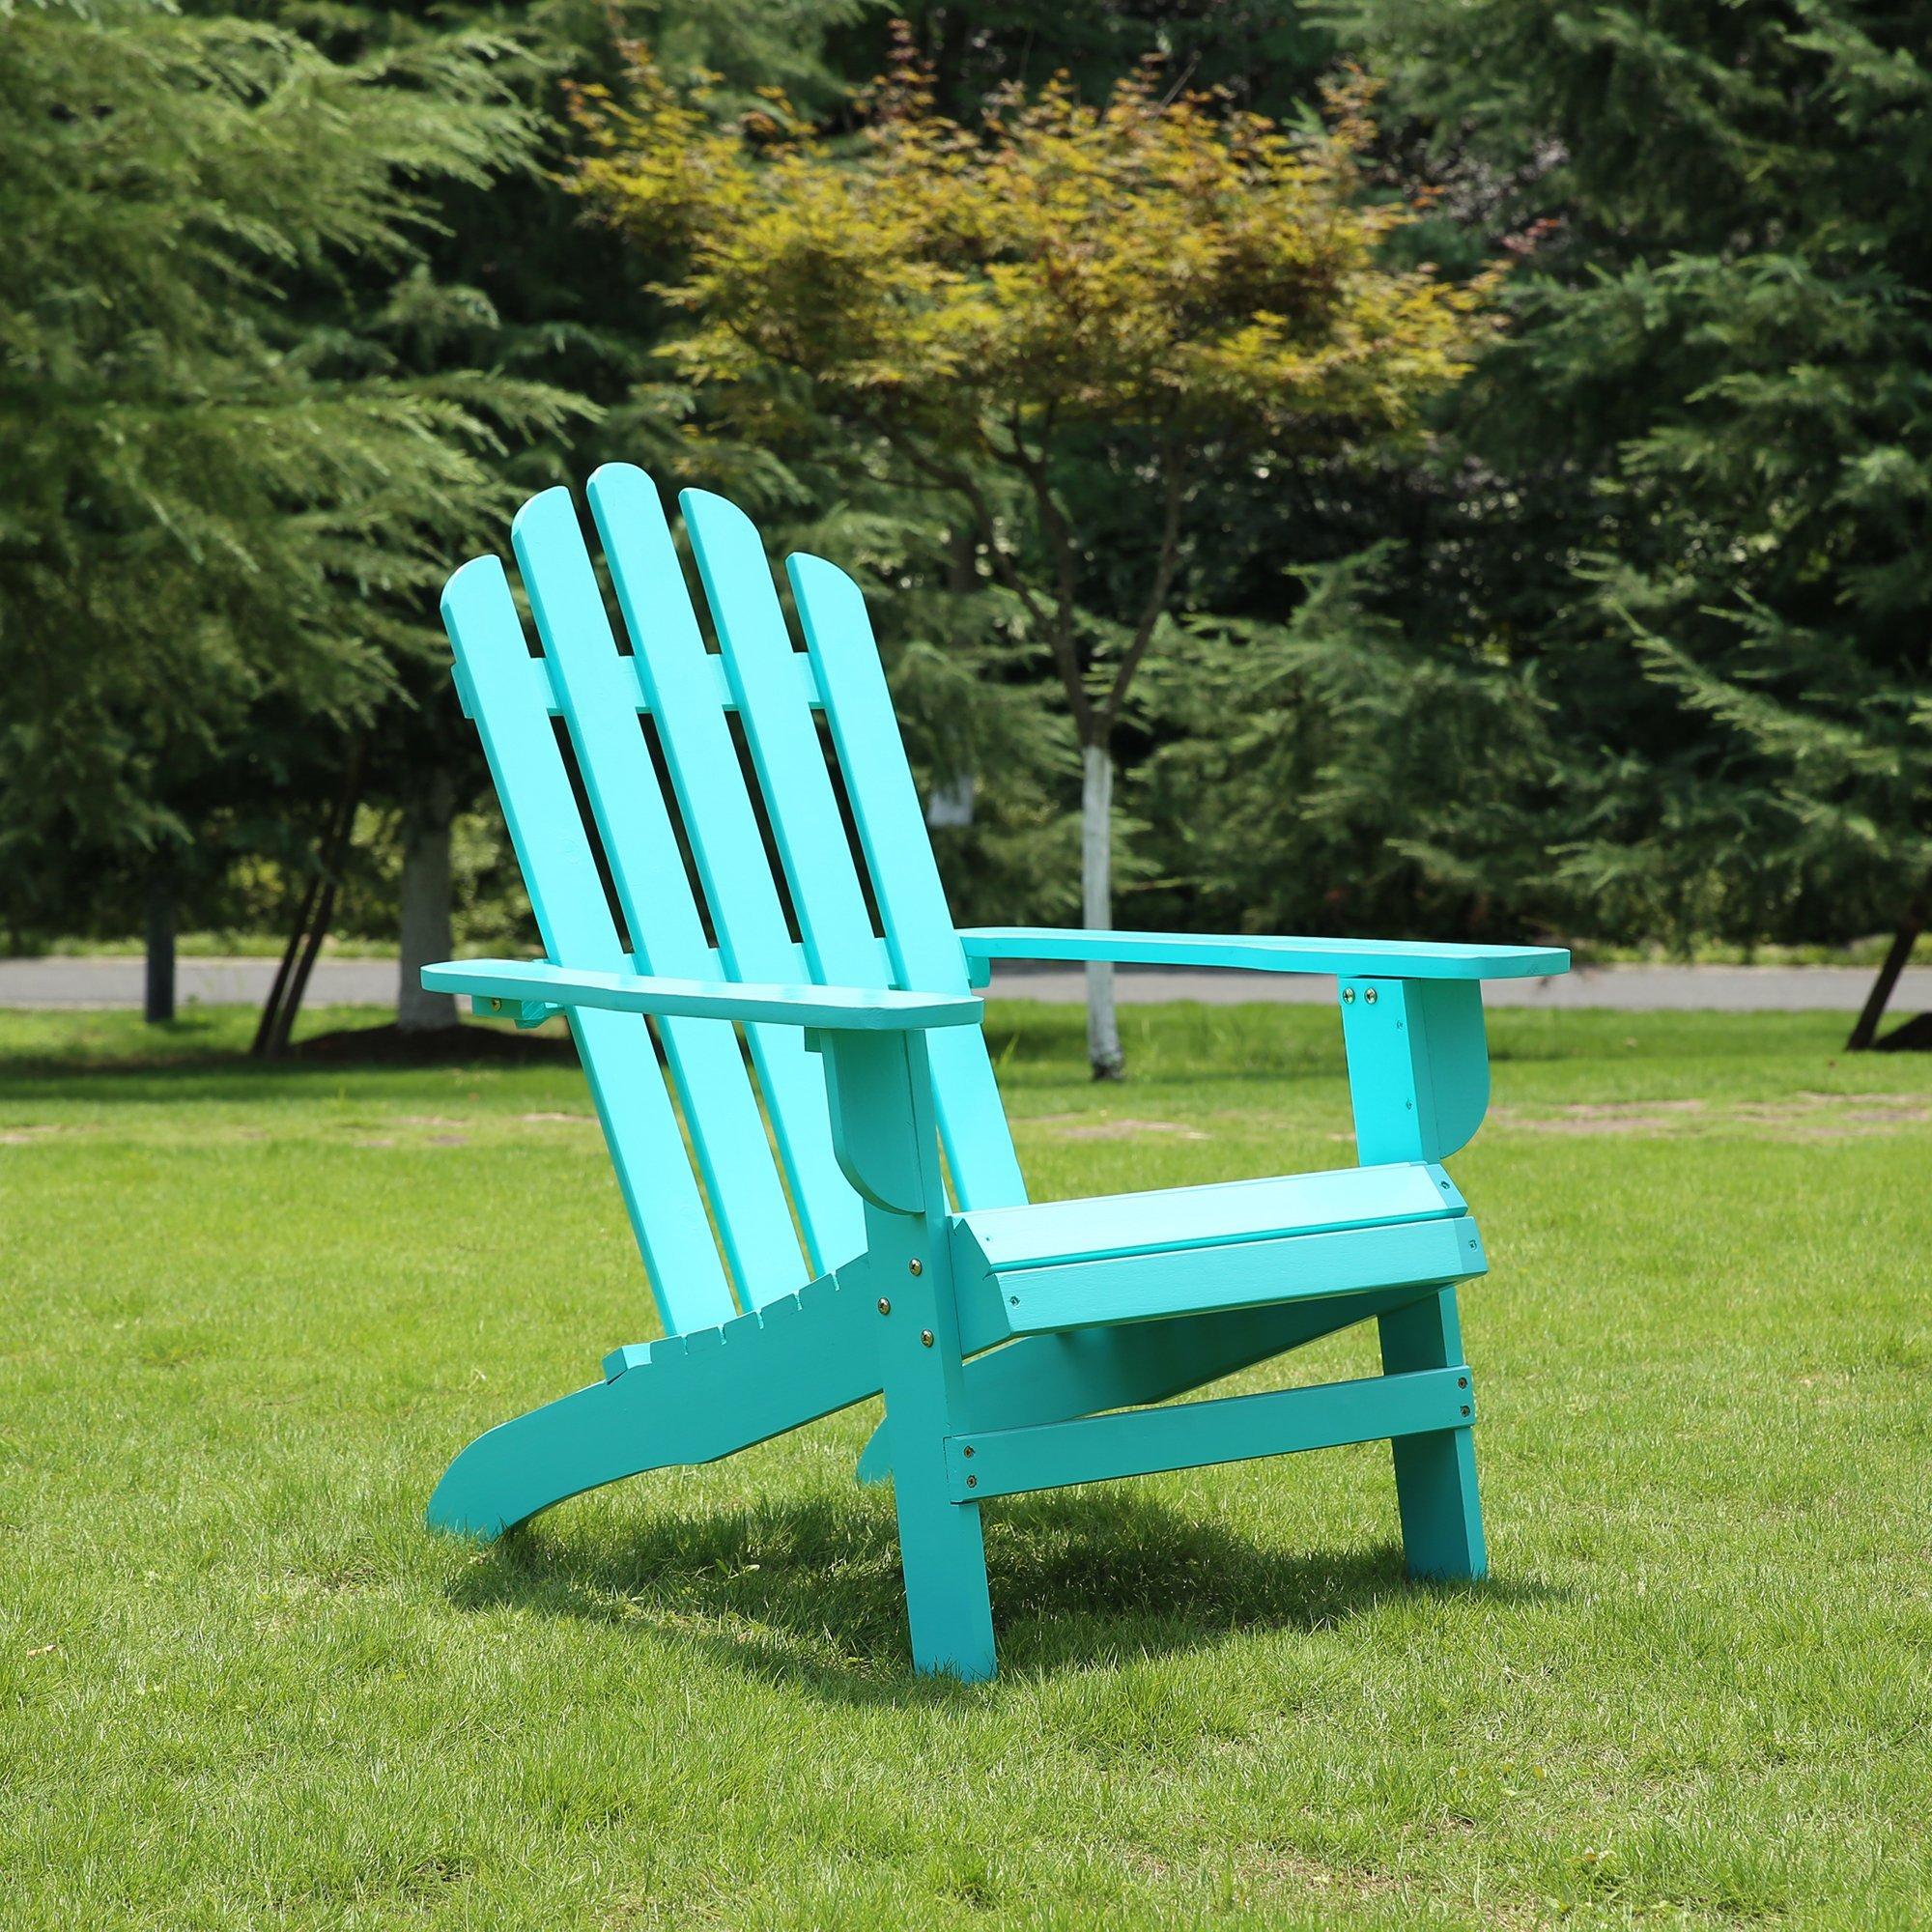 Azbro Outdoor Wooden Fashion Adirondack chair/Muskoka Chairs Patio Deck Garden Furniture,Turquoise